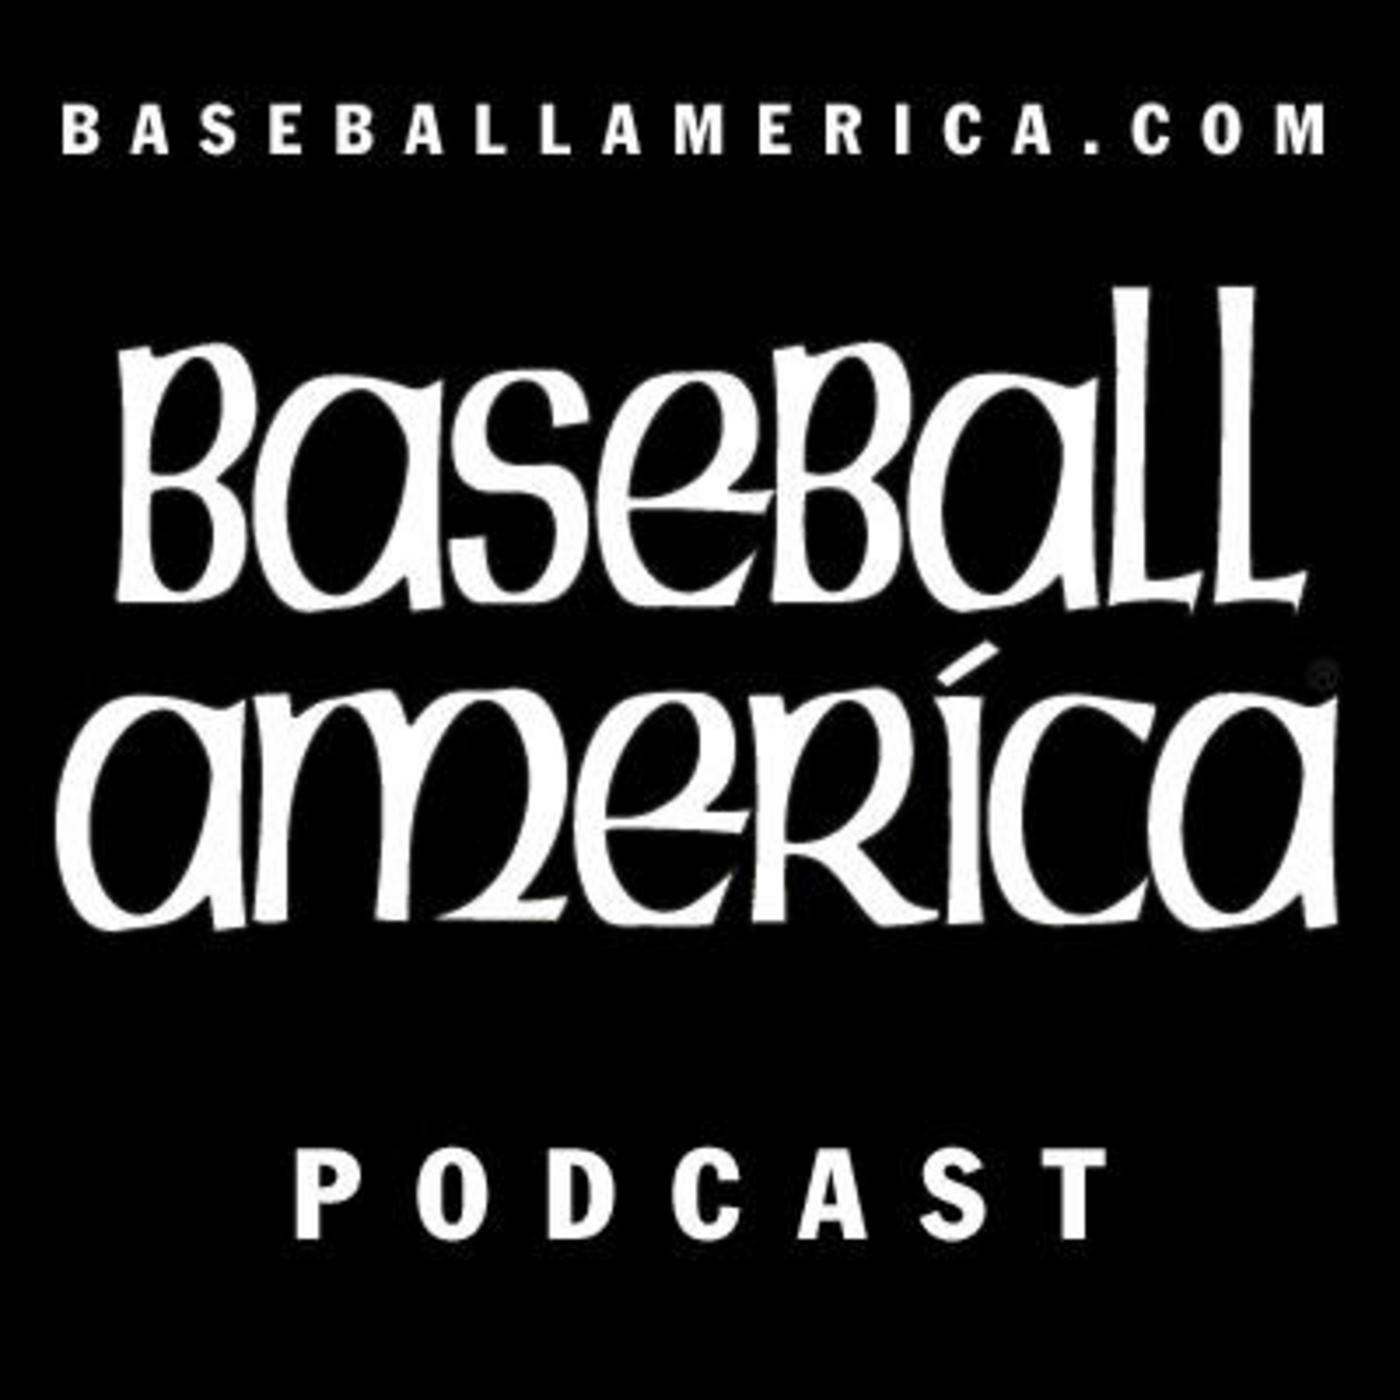 Baseball America College Podcast: 04/09/12